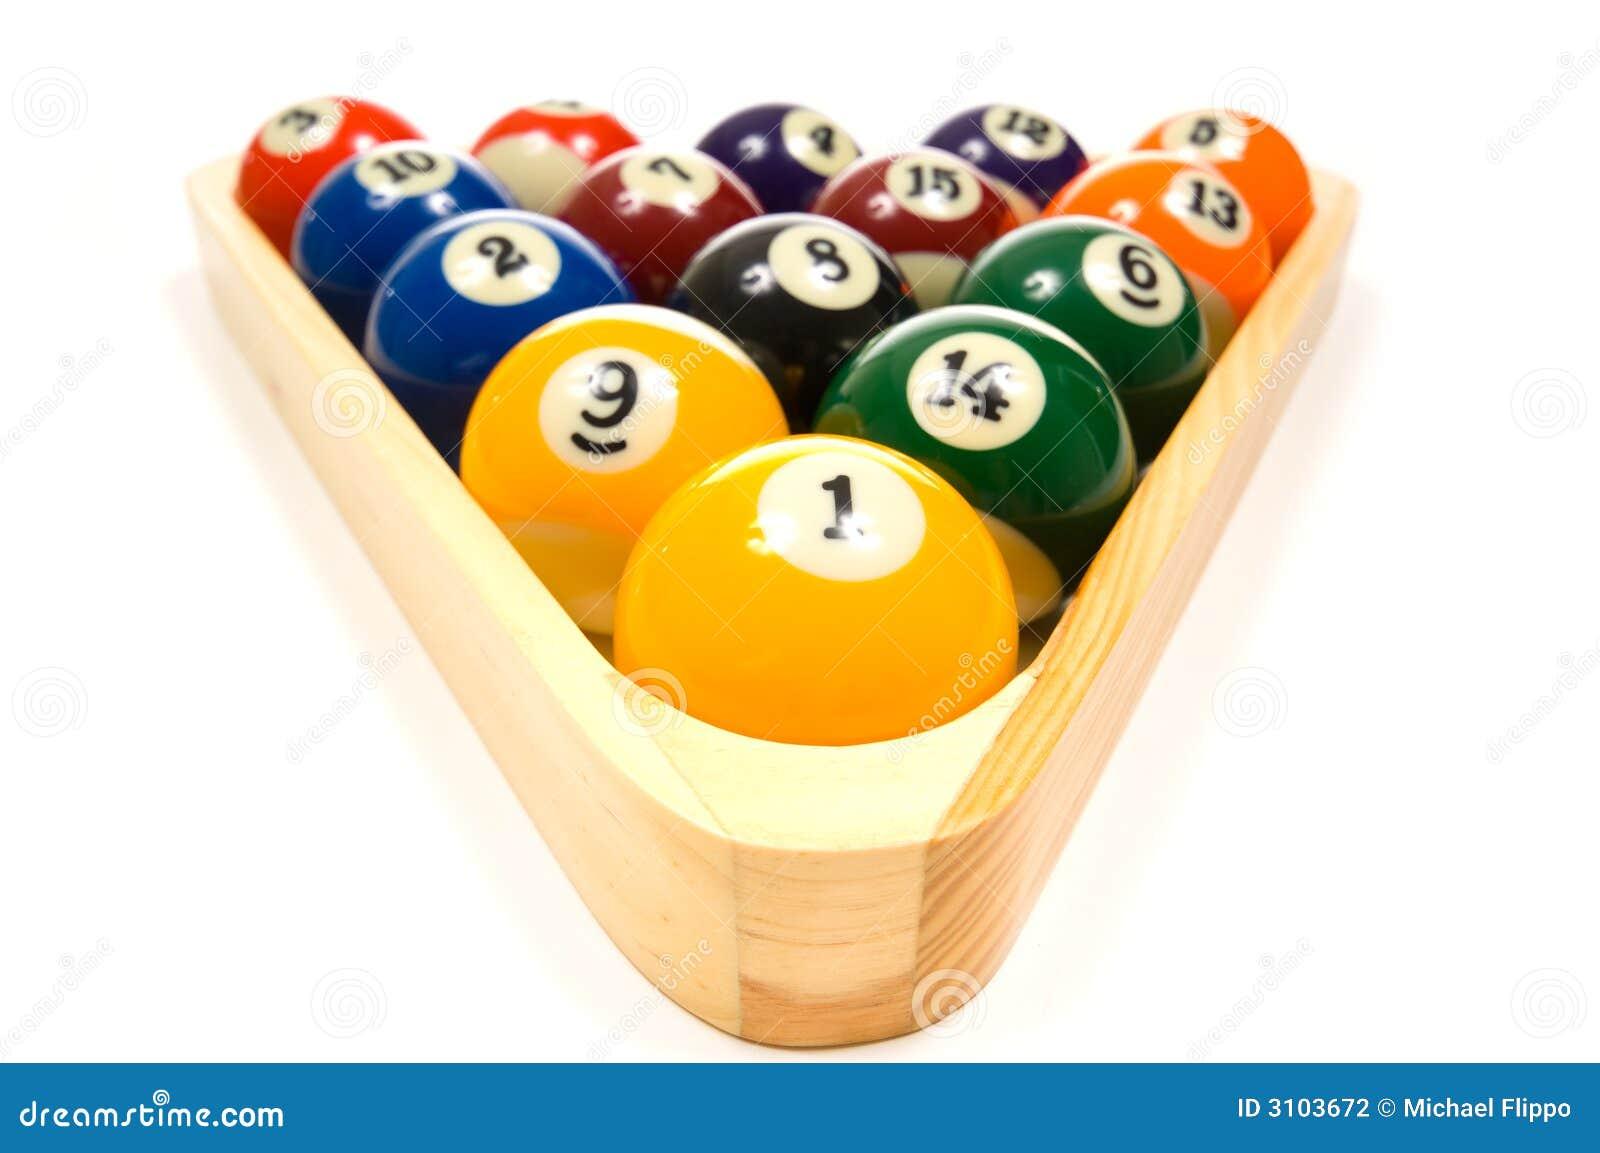 How to Clean Billiard Balls